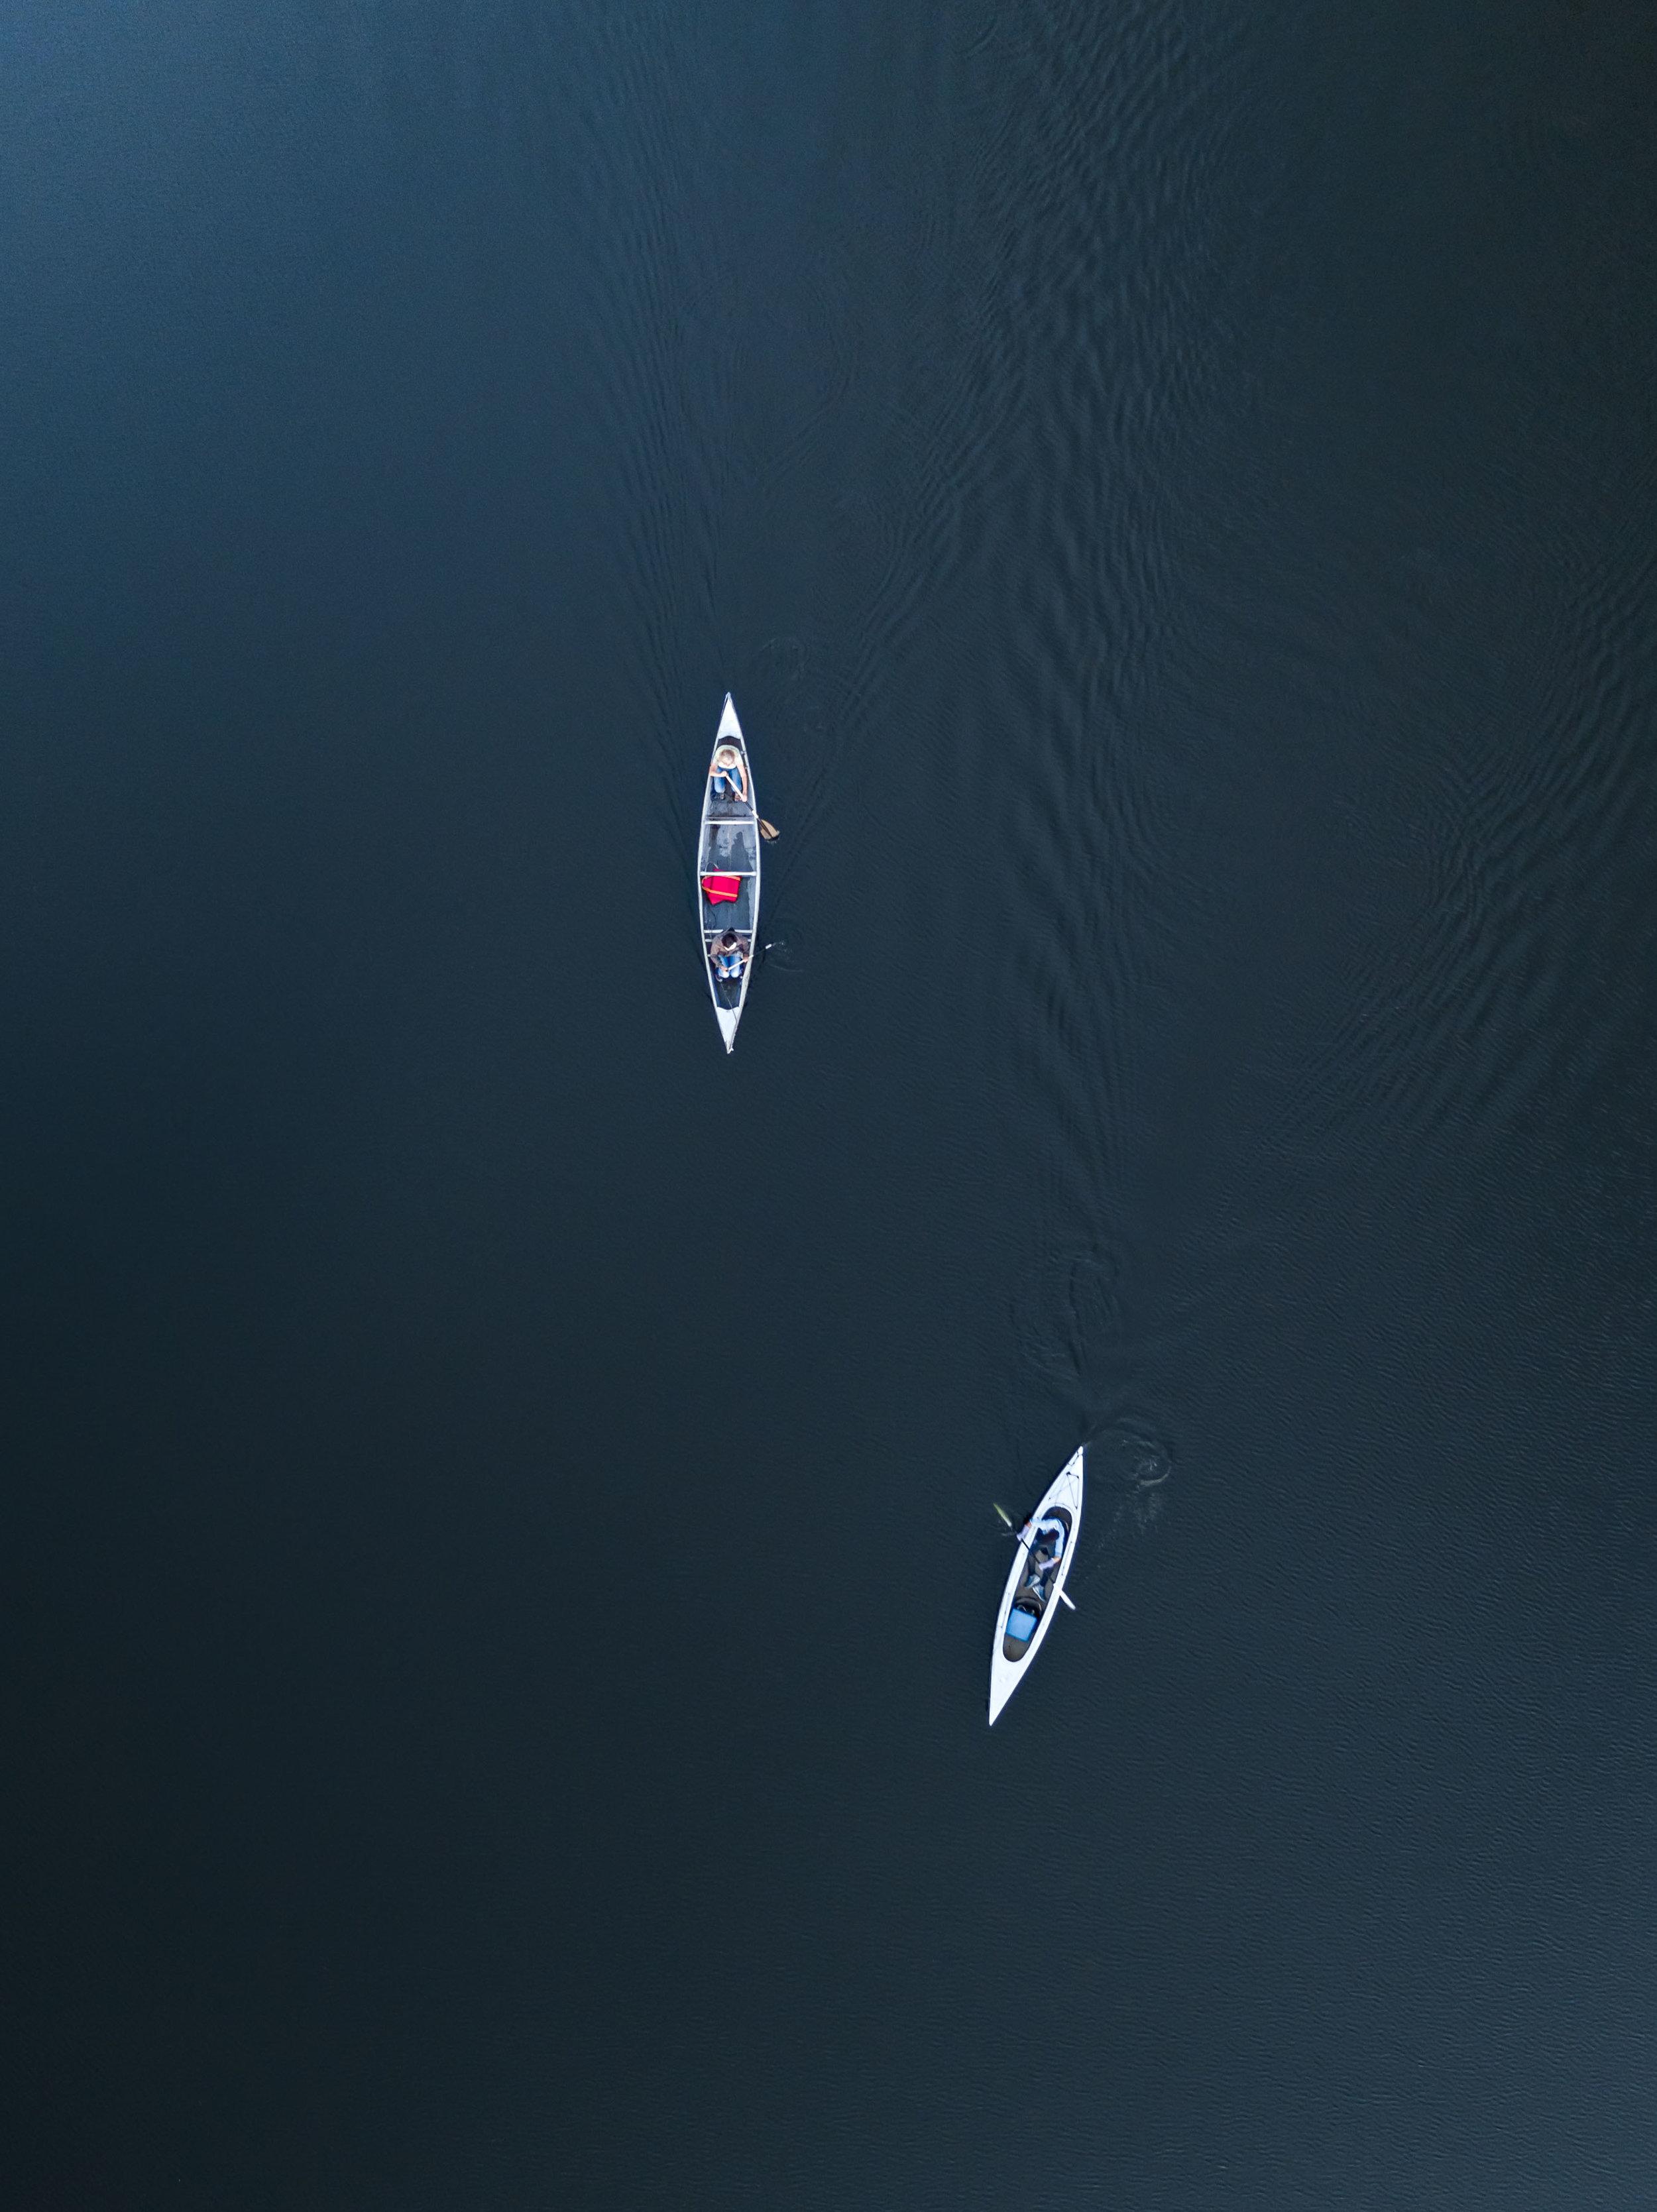 notarace_typoland_aerial-1.jpg